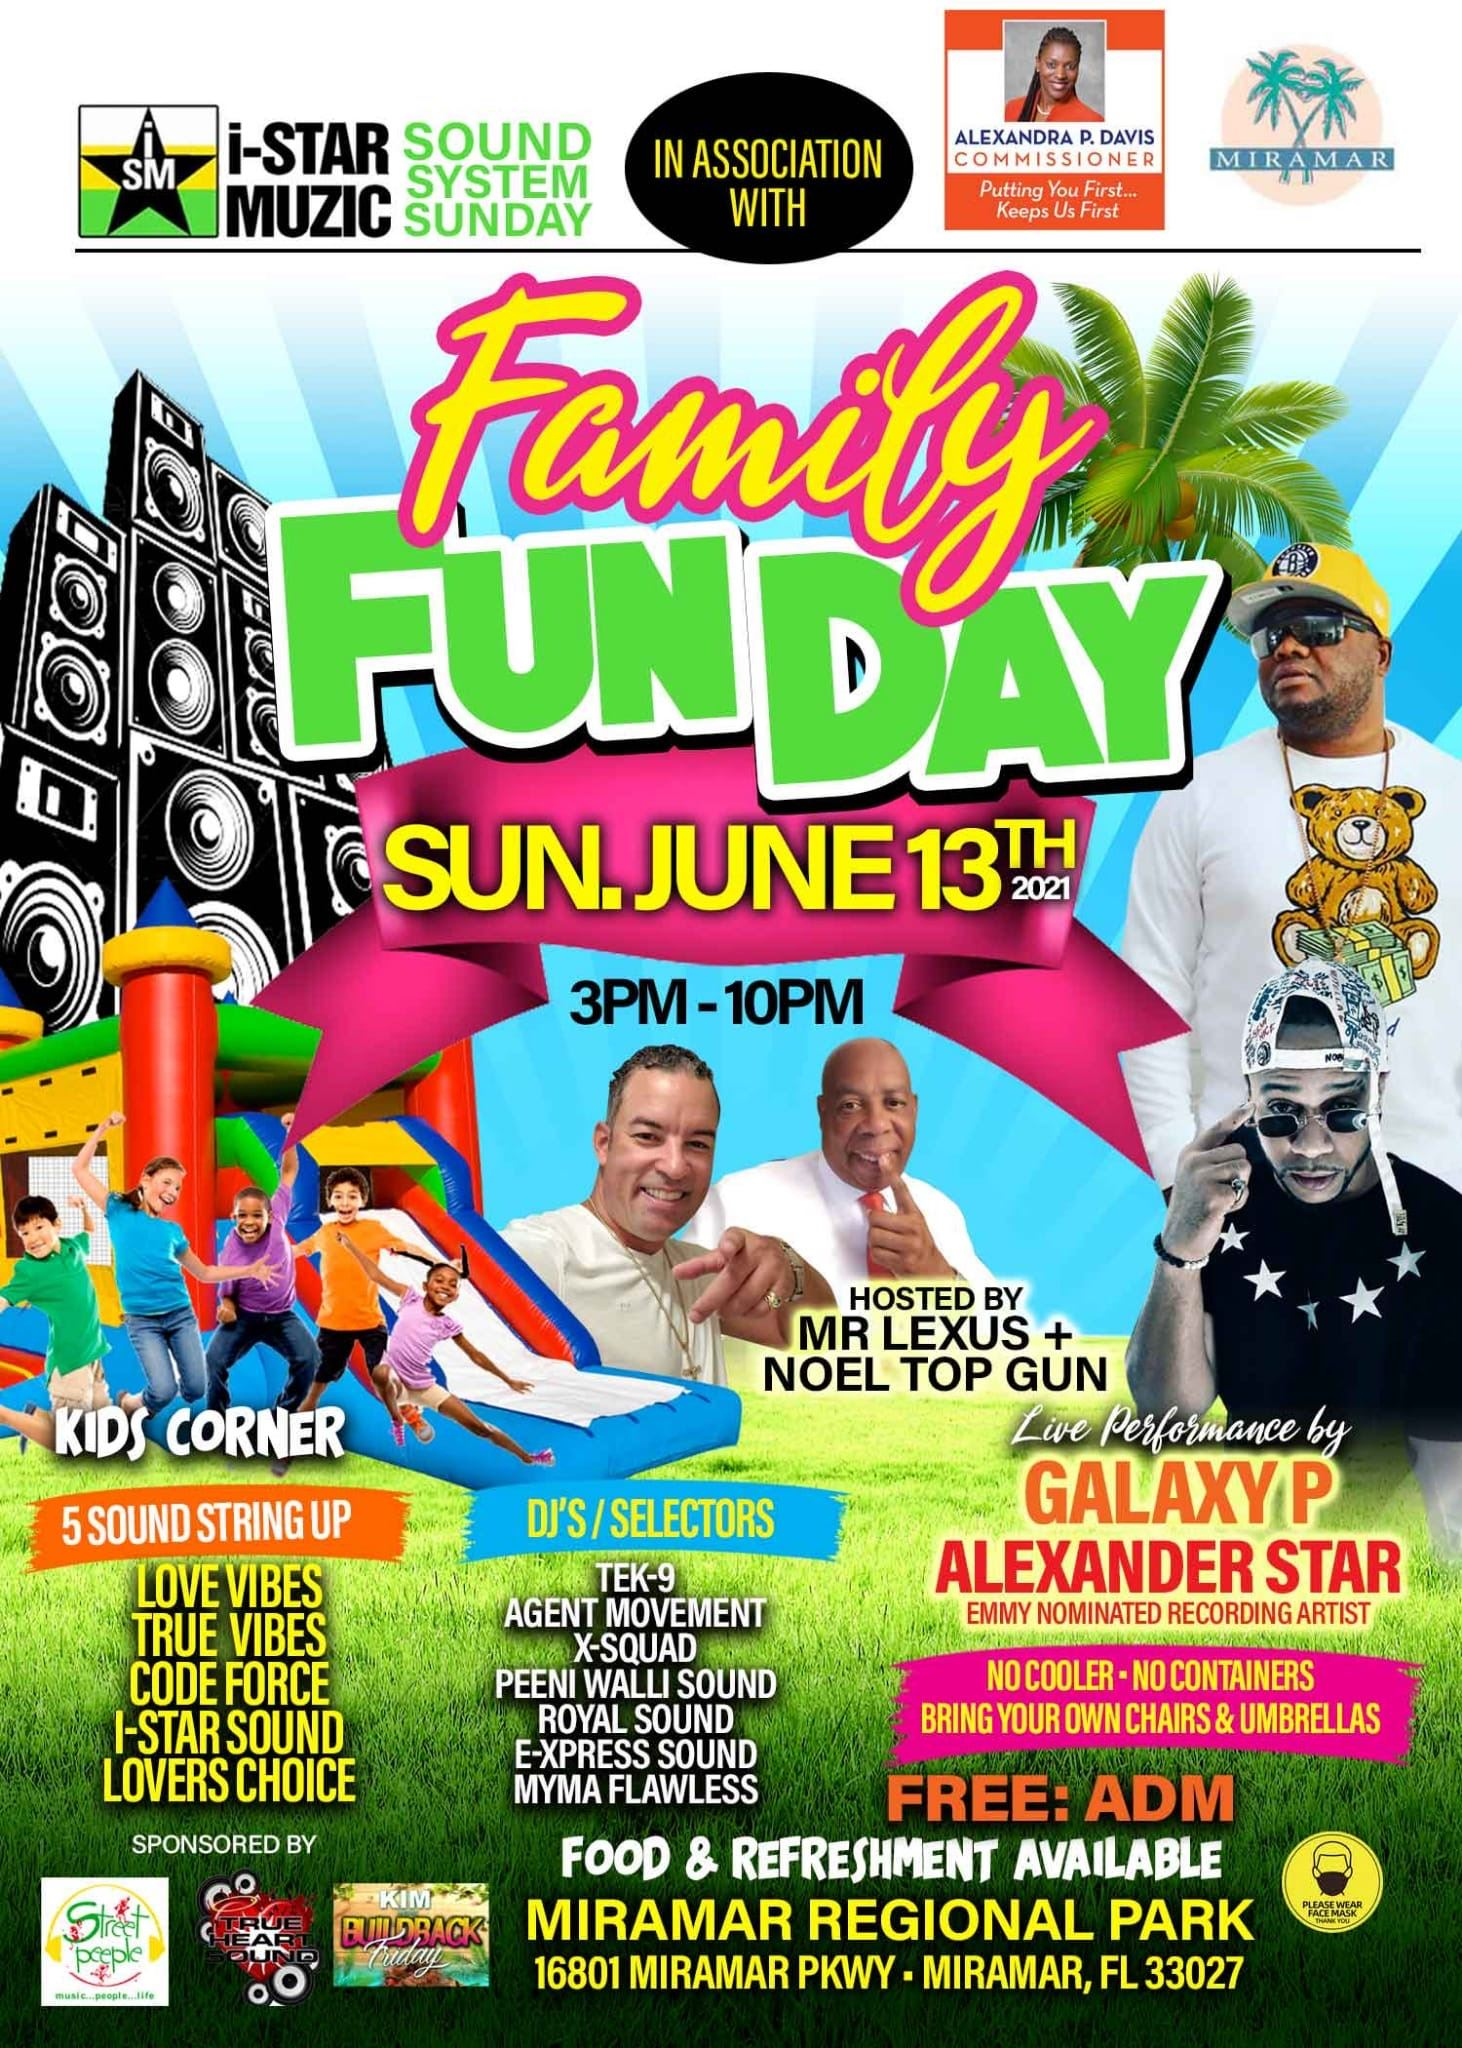 Chambers Family Fun Day June 13 2021